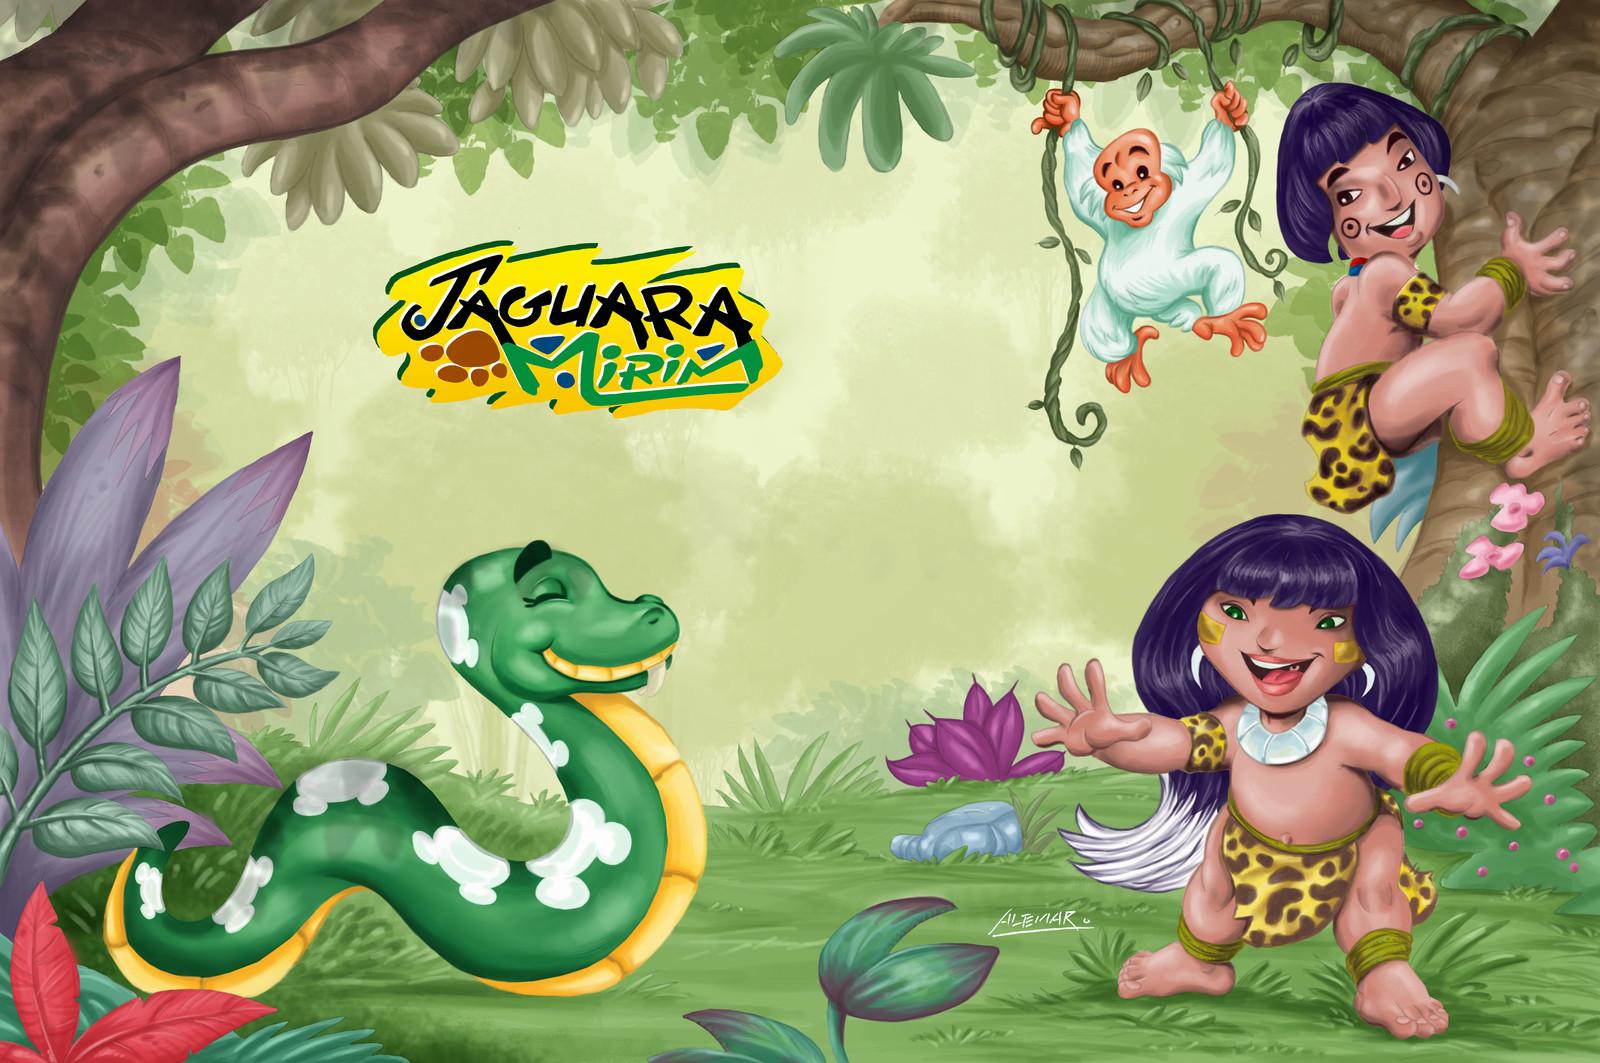 Jaguara Mirim - Meet her friends Nora, Joati and Kaique